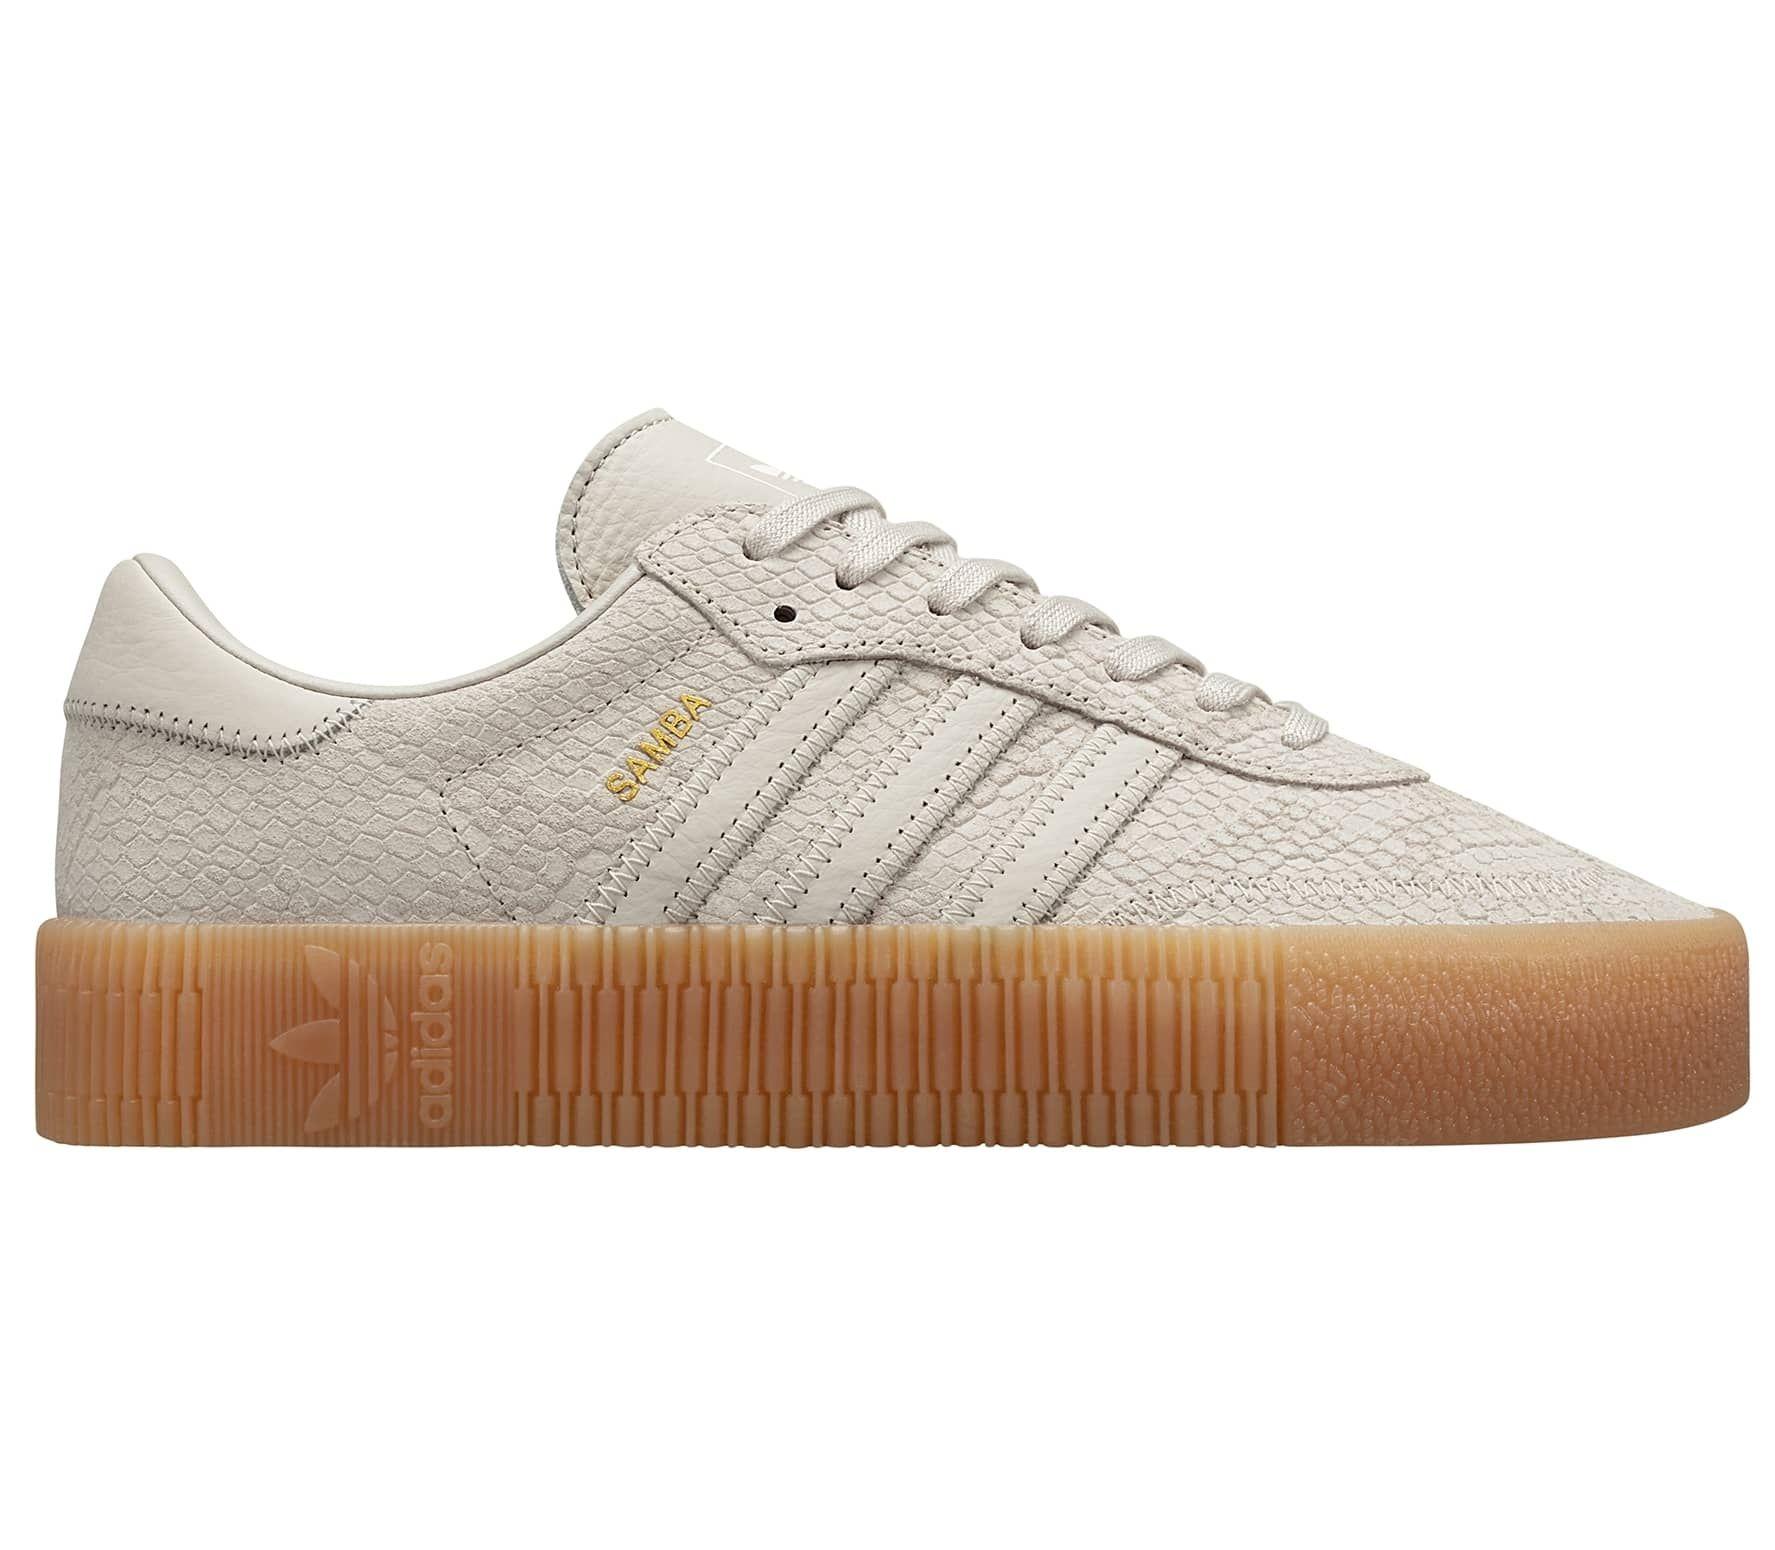 Sambarose Dames Sneakers in 2019 - Nike schoenen, Schoenen ...